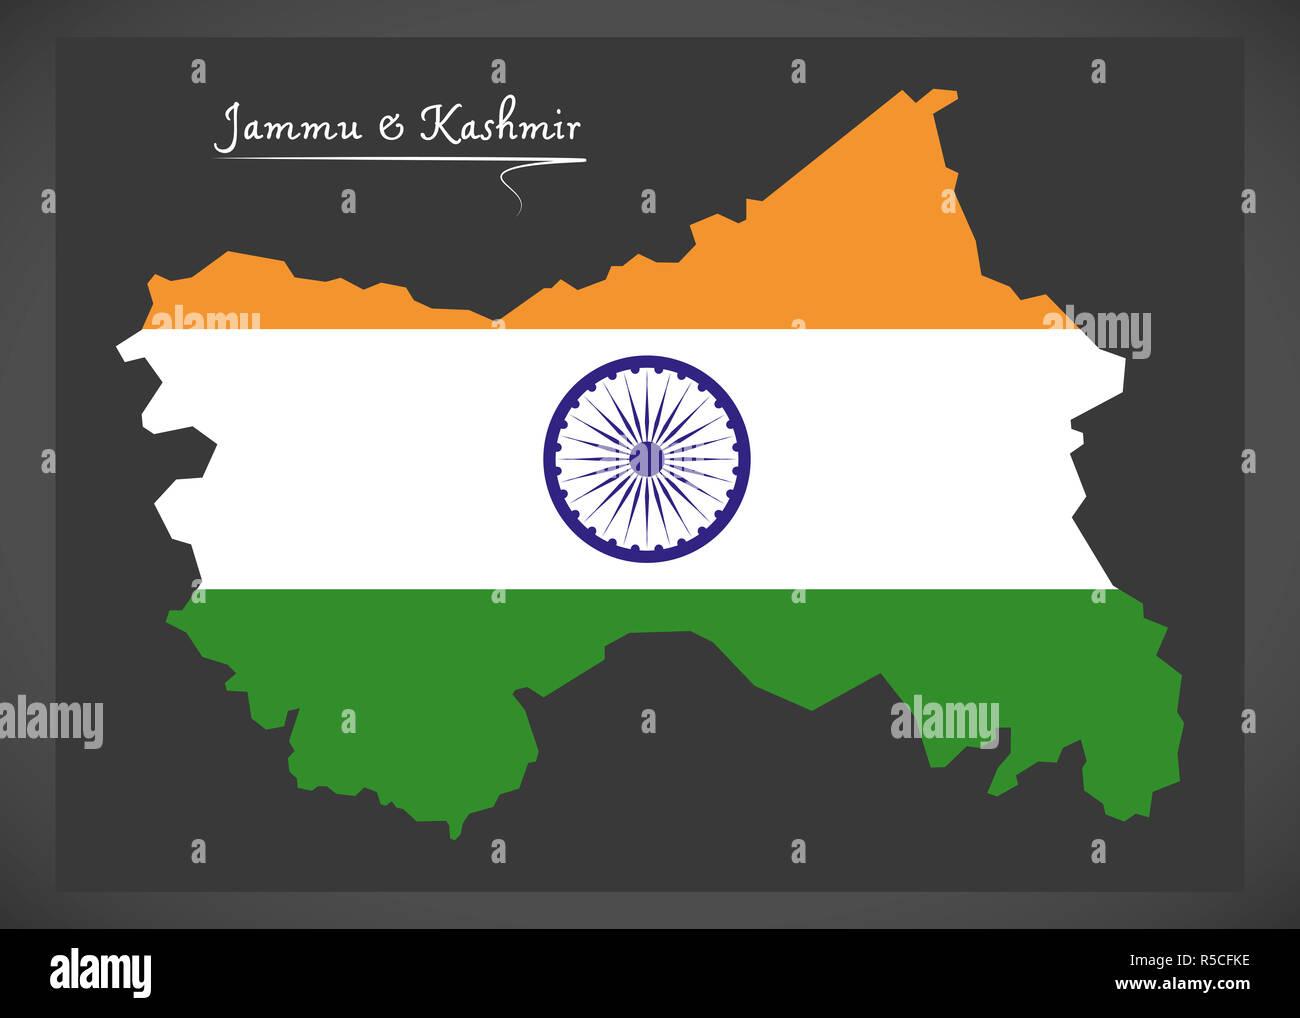 map jammu and kashmir flag Jammu And Kashmir Map With Indian National Flag Illustration Stock map jammu and kashmir flag